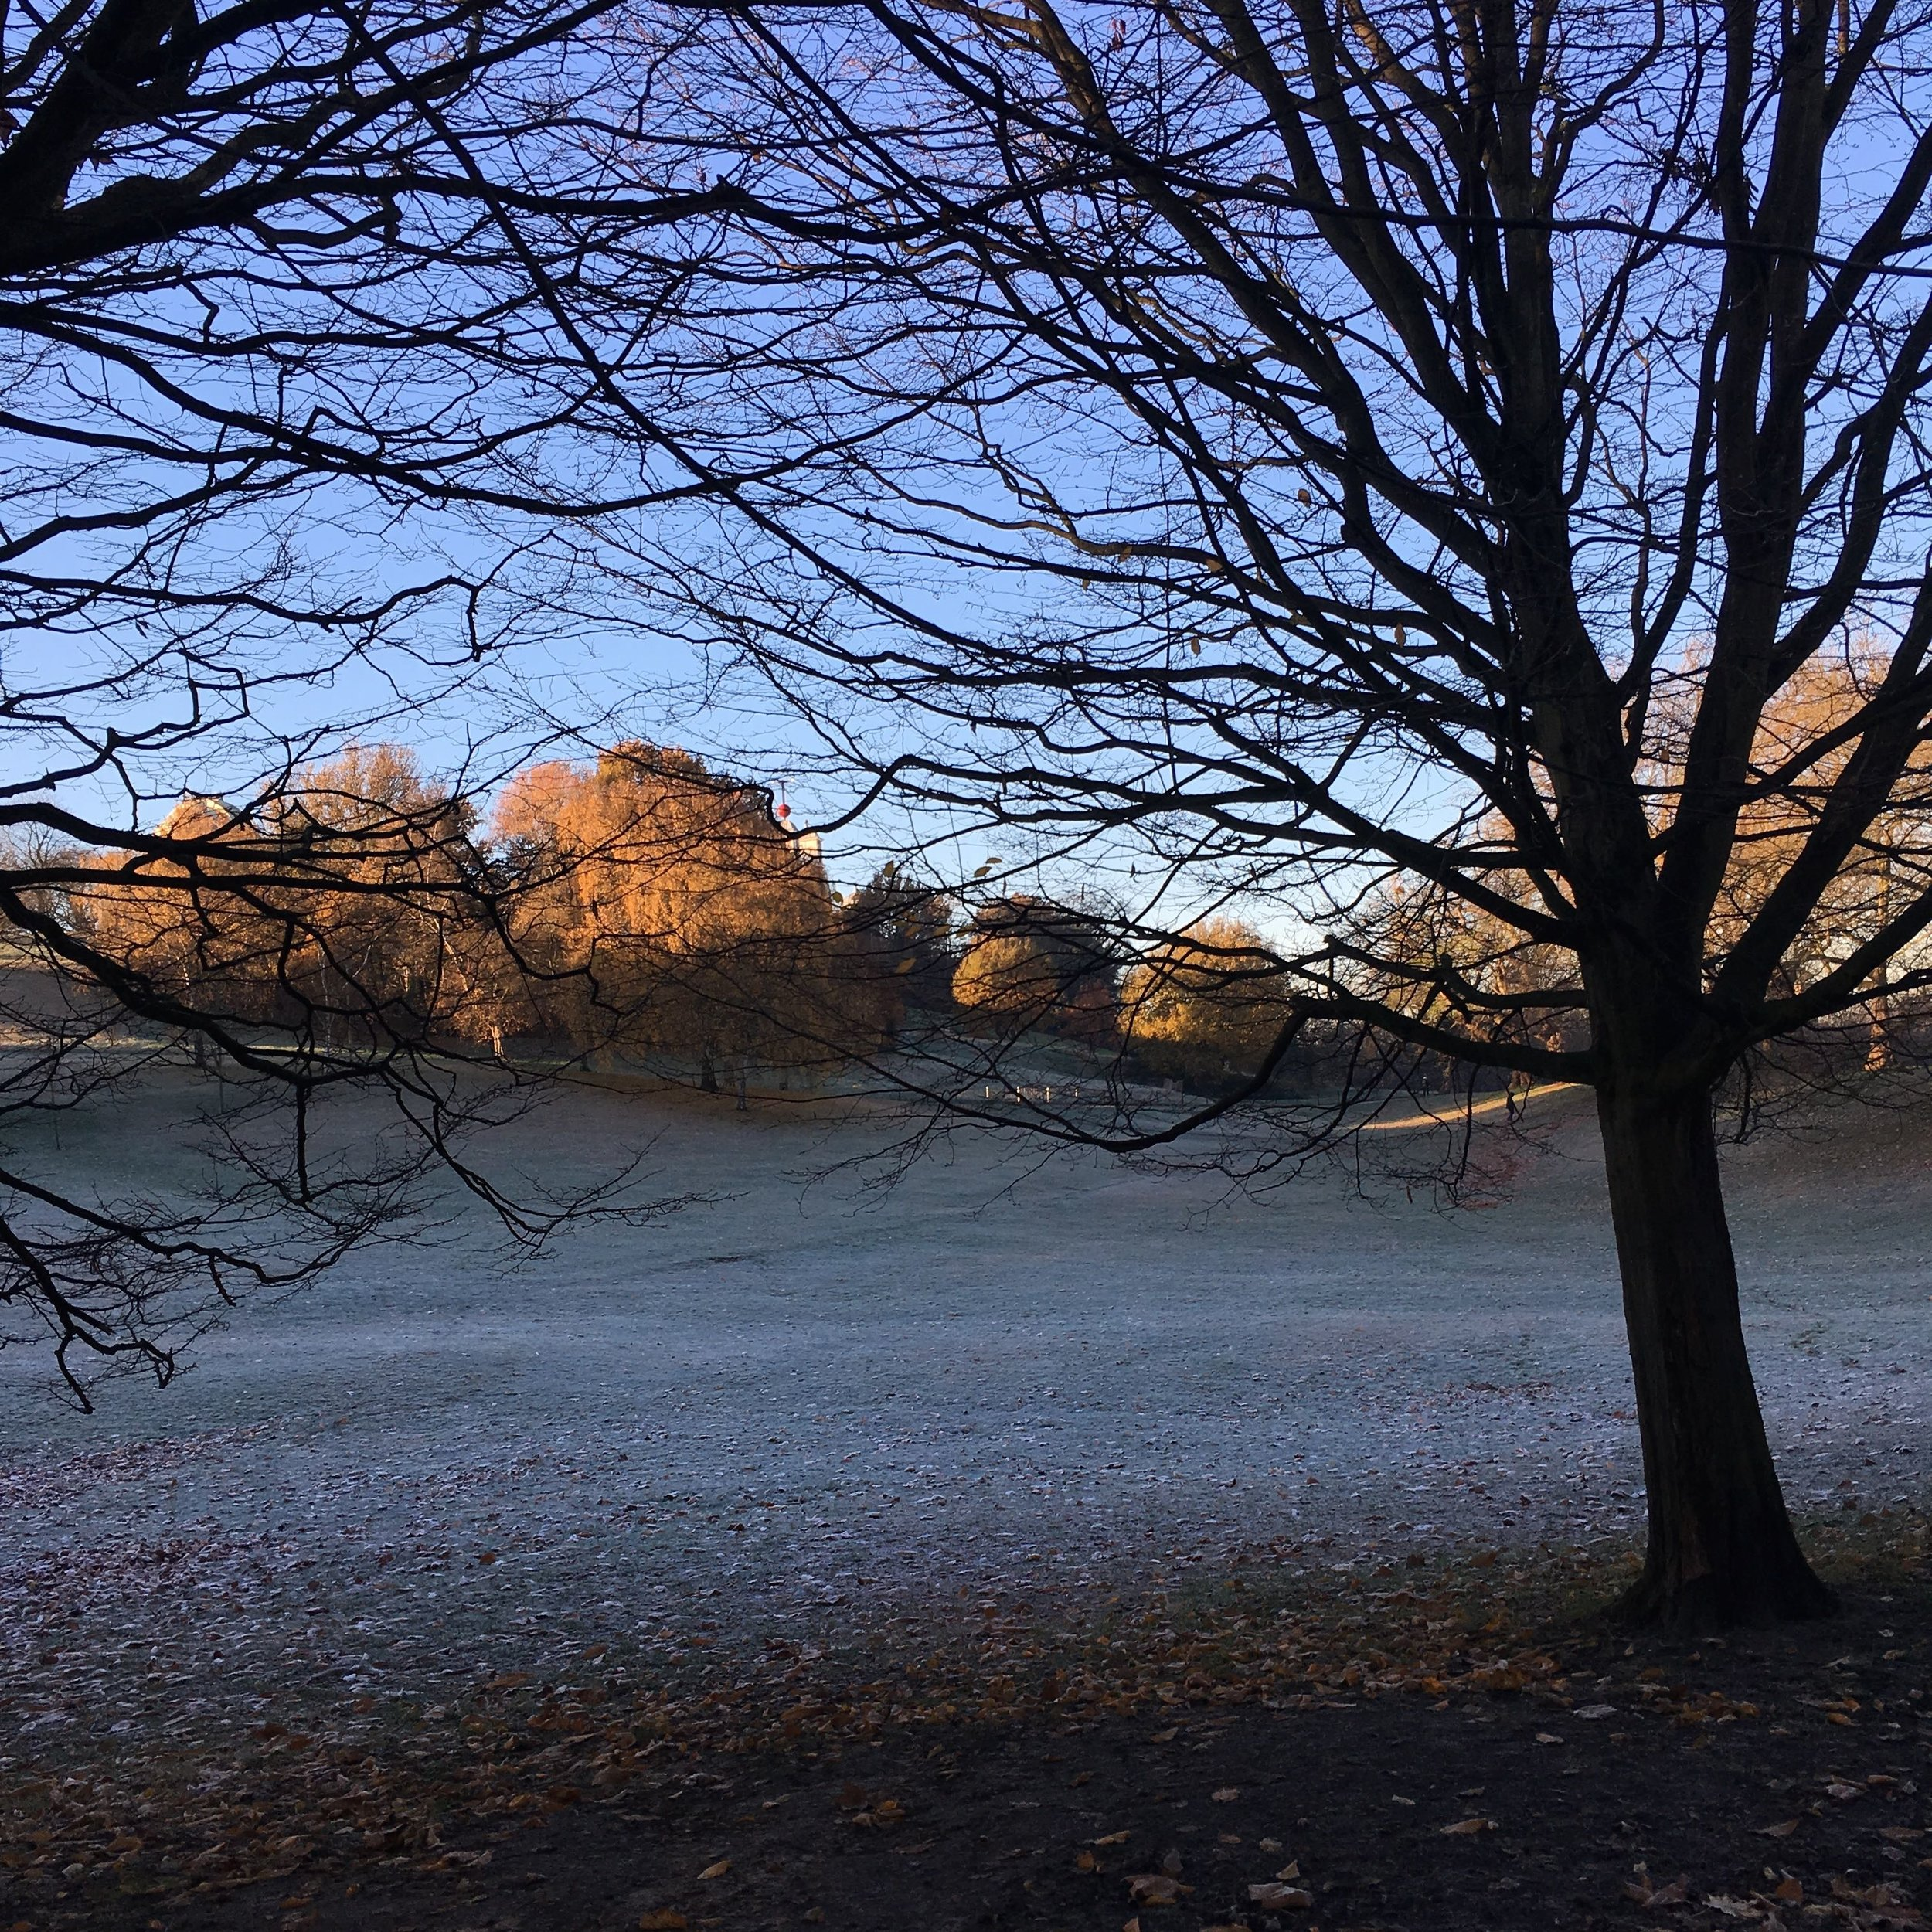 A frosty morning in Greenwich Park, London